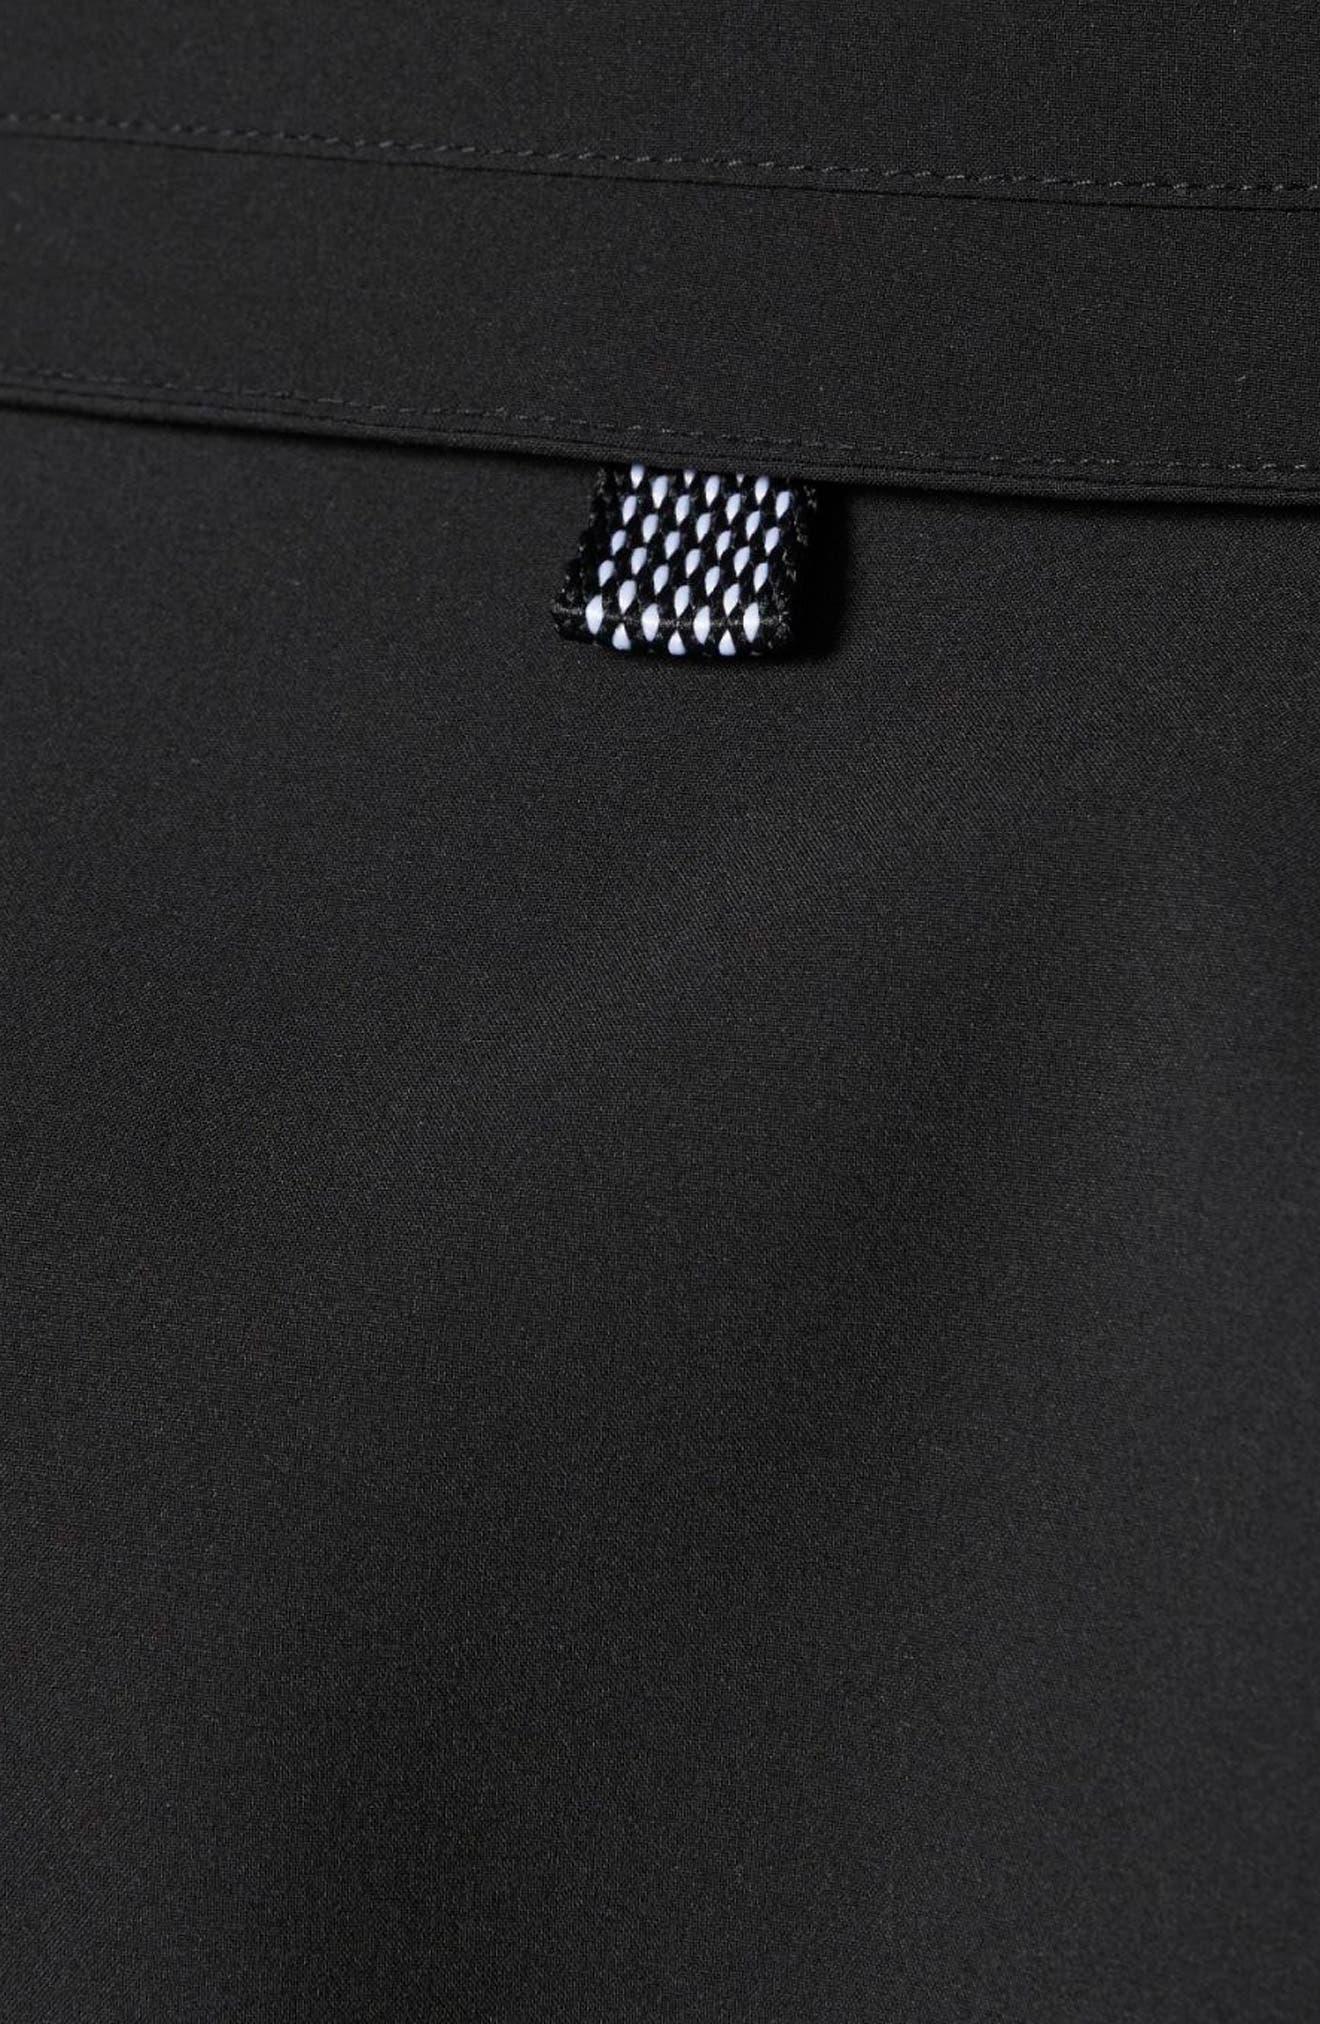 CR8 Coach's Jacket,                             Alternate thumbnail 4, color,                             Black